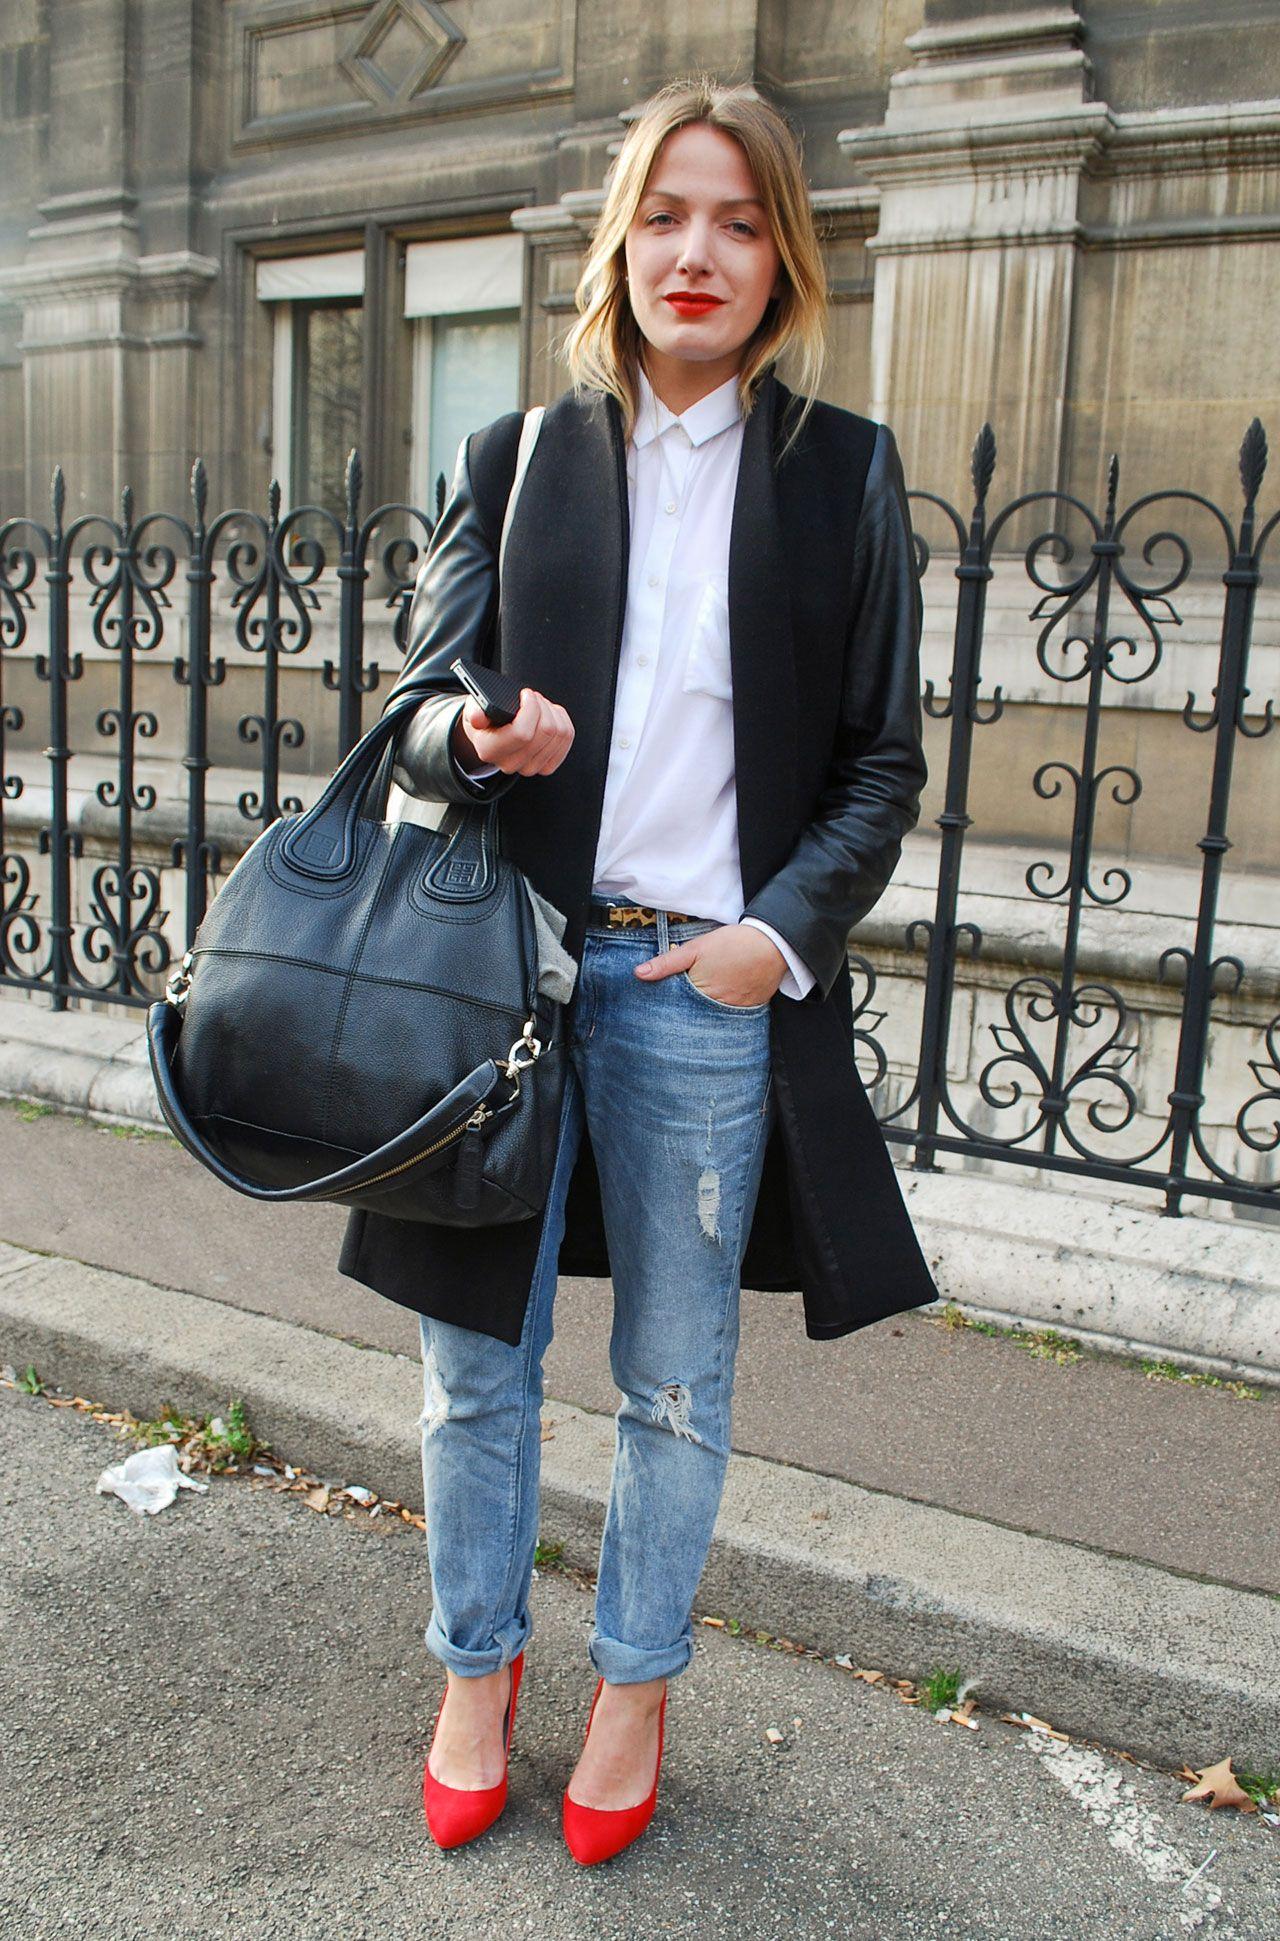 #Simple #Style #Fashion